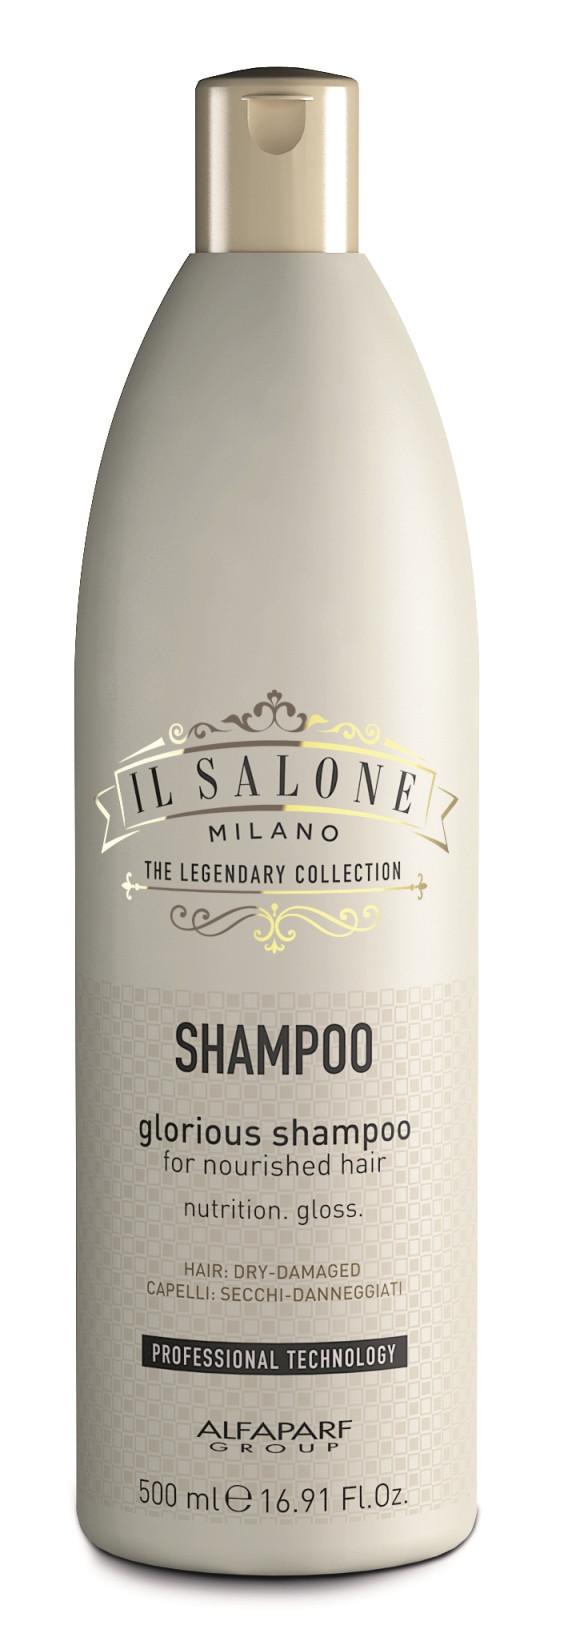 Alfaparf Milano Il Salone Glorious Shampoo 500ml